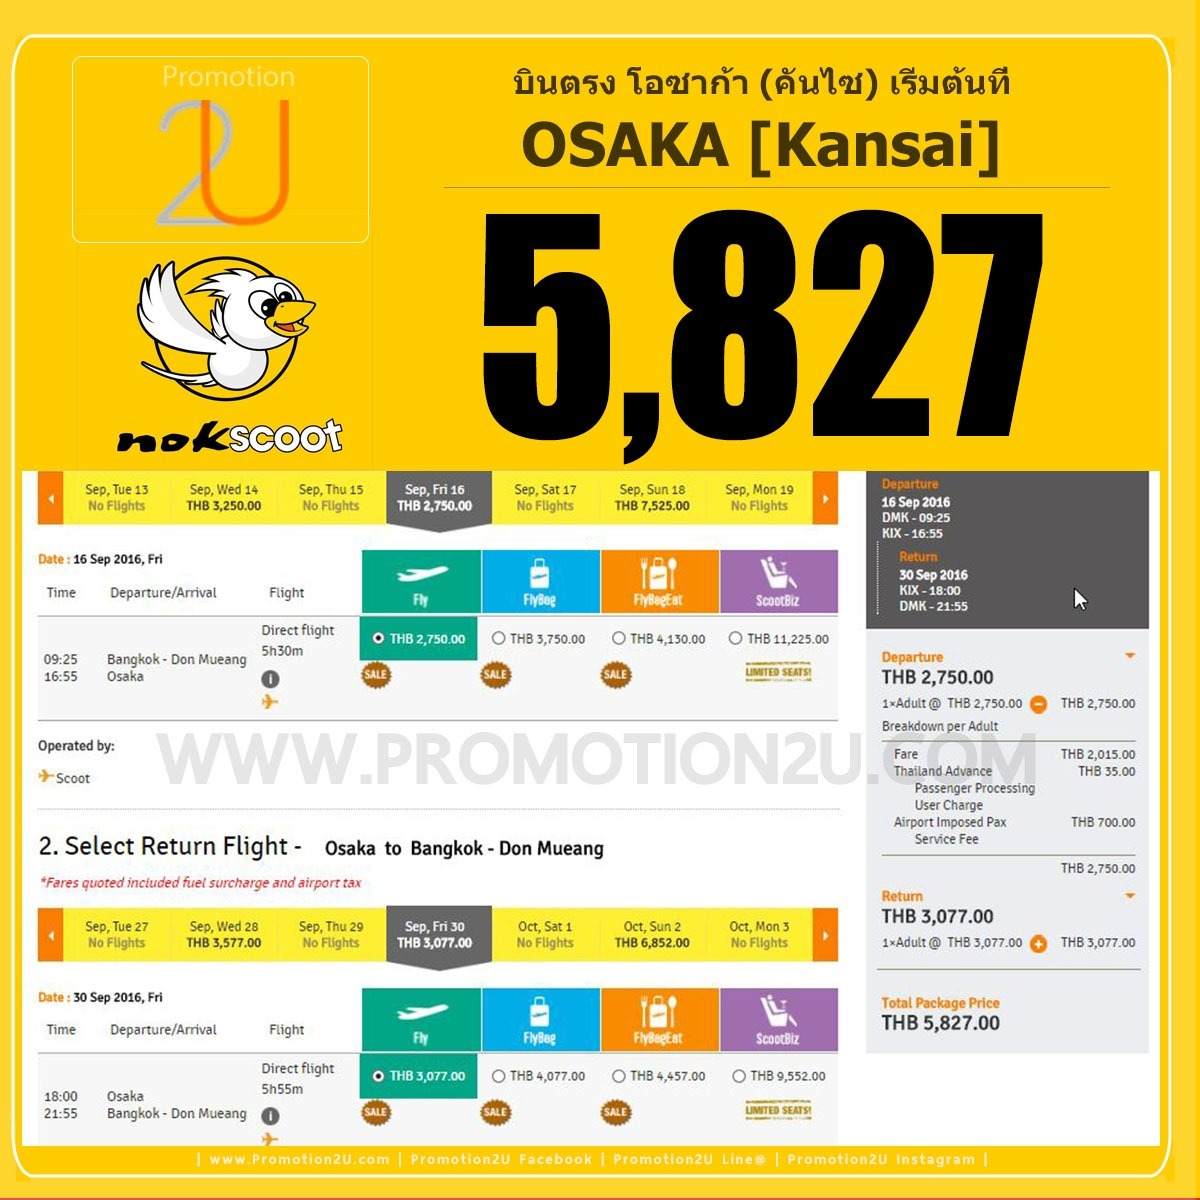 omotion-nokscoot-fly-to-japan-osaka-started-2750-P05